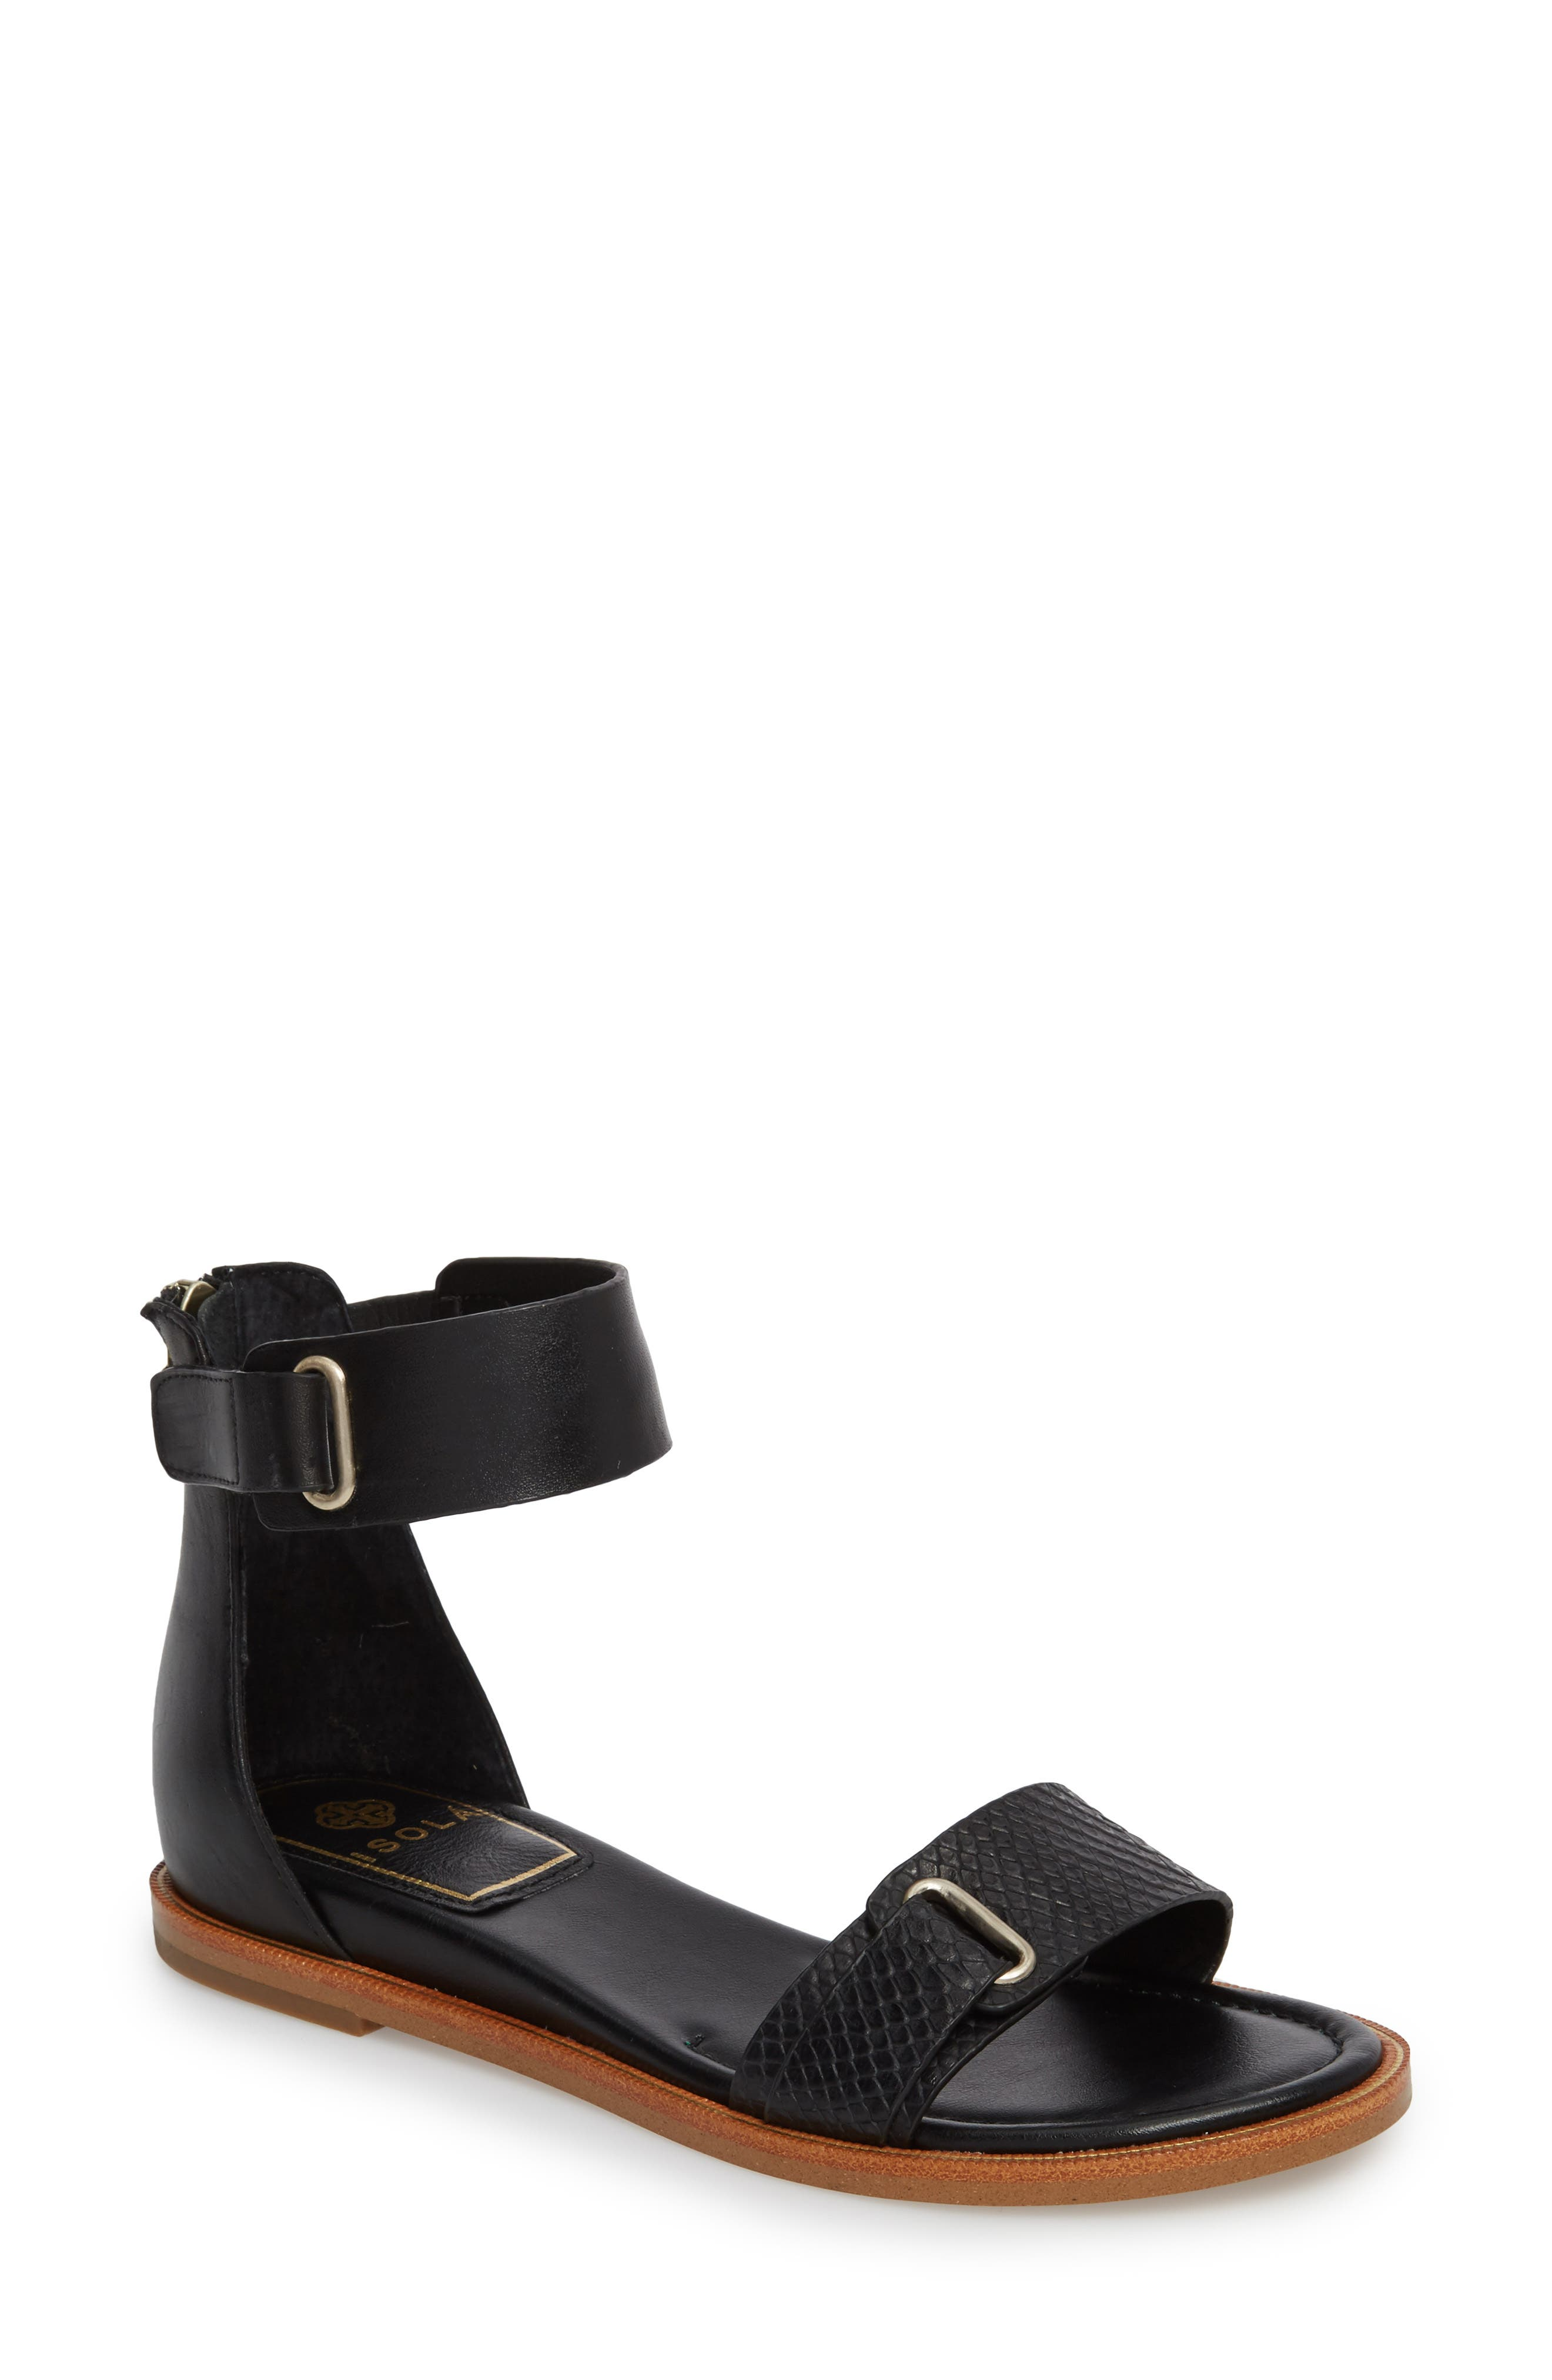 ISOLÁ, Savina Ankle Strap Sandal, Main thumbnail 1, color, BLACK LEATHER